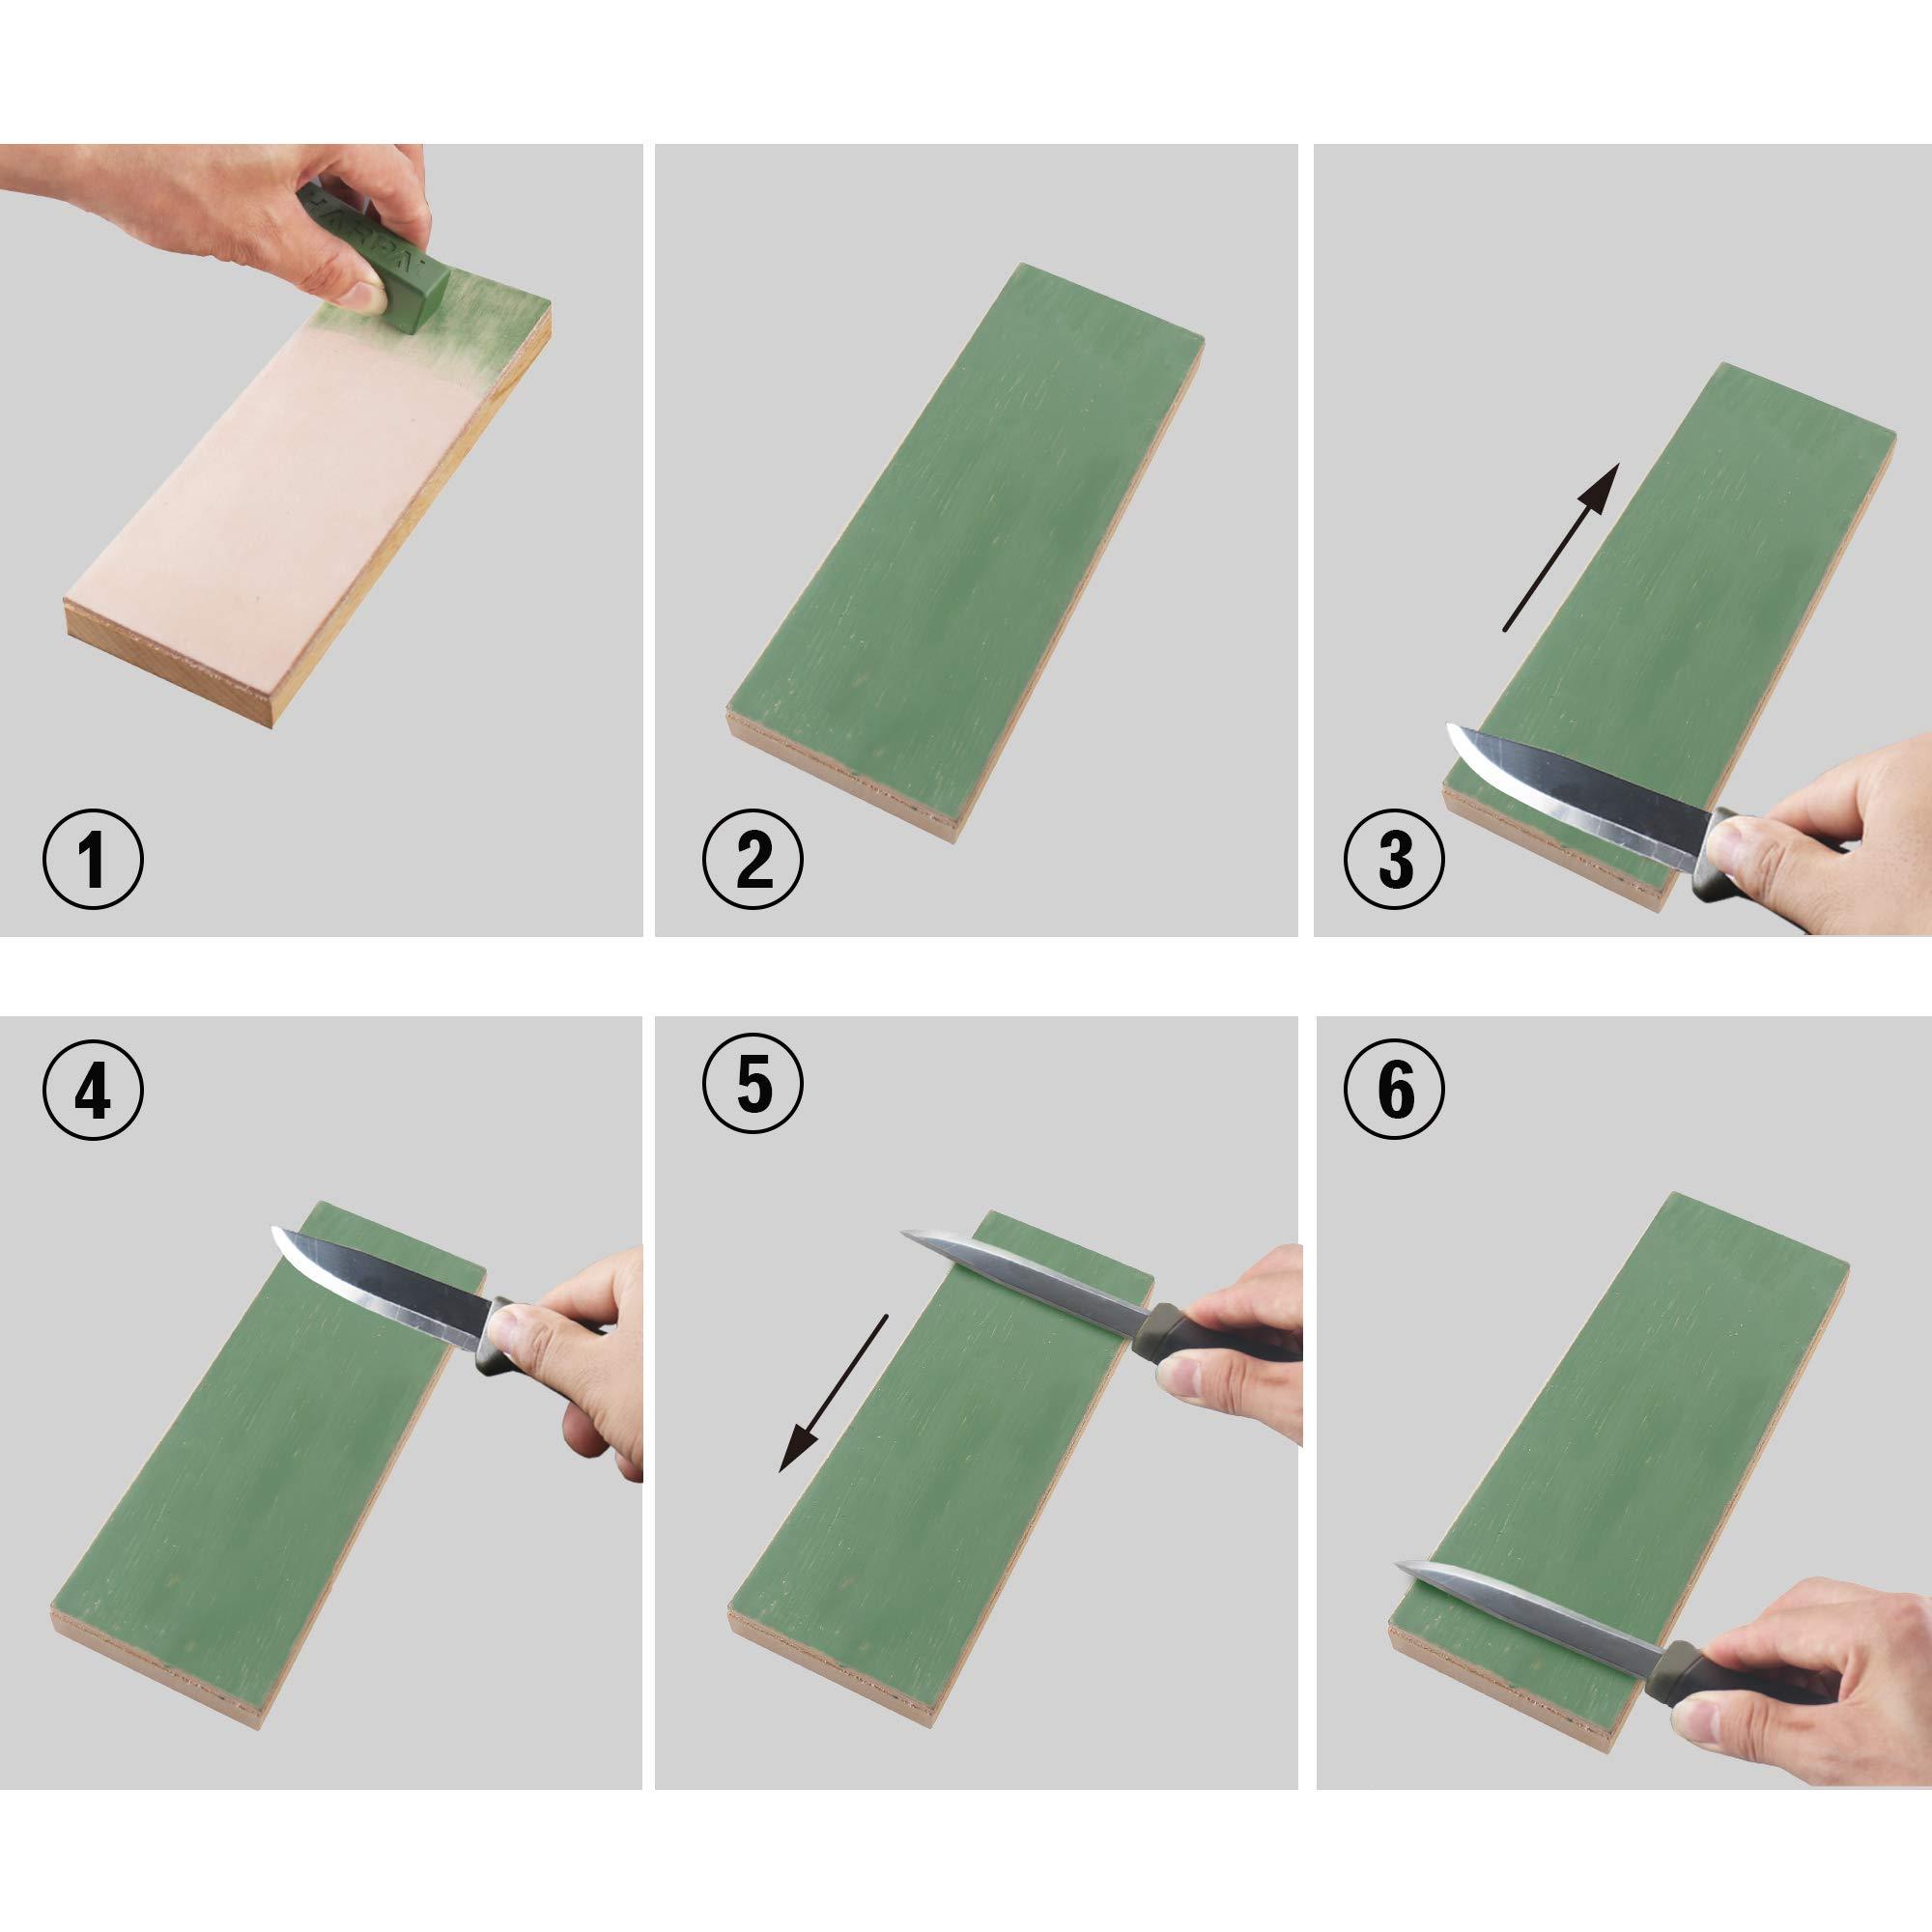 cinceles para tallar madera maquinilla de afeitar recta SHARPAL Bloque para afilar y afilar cuchillos